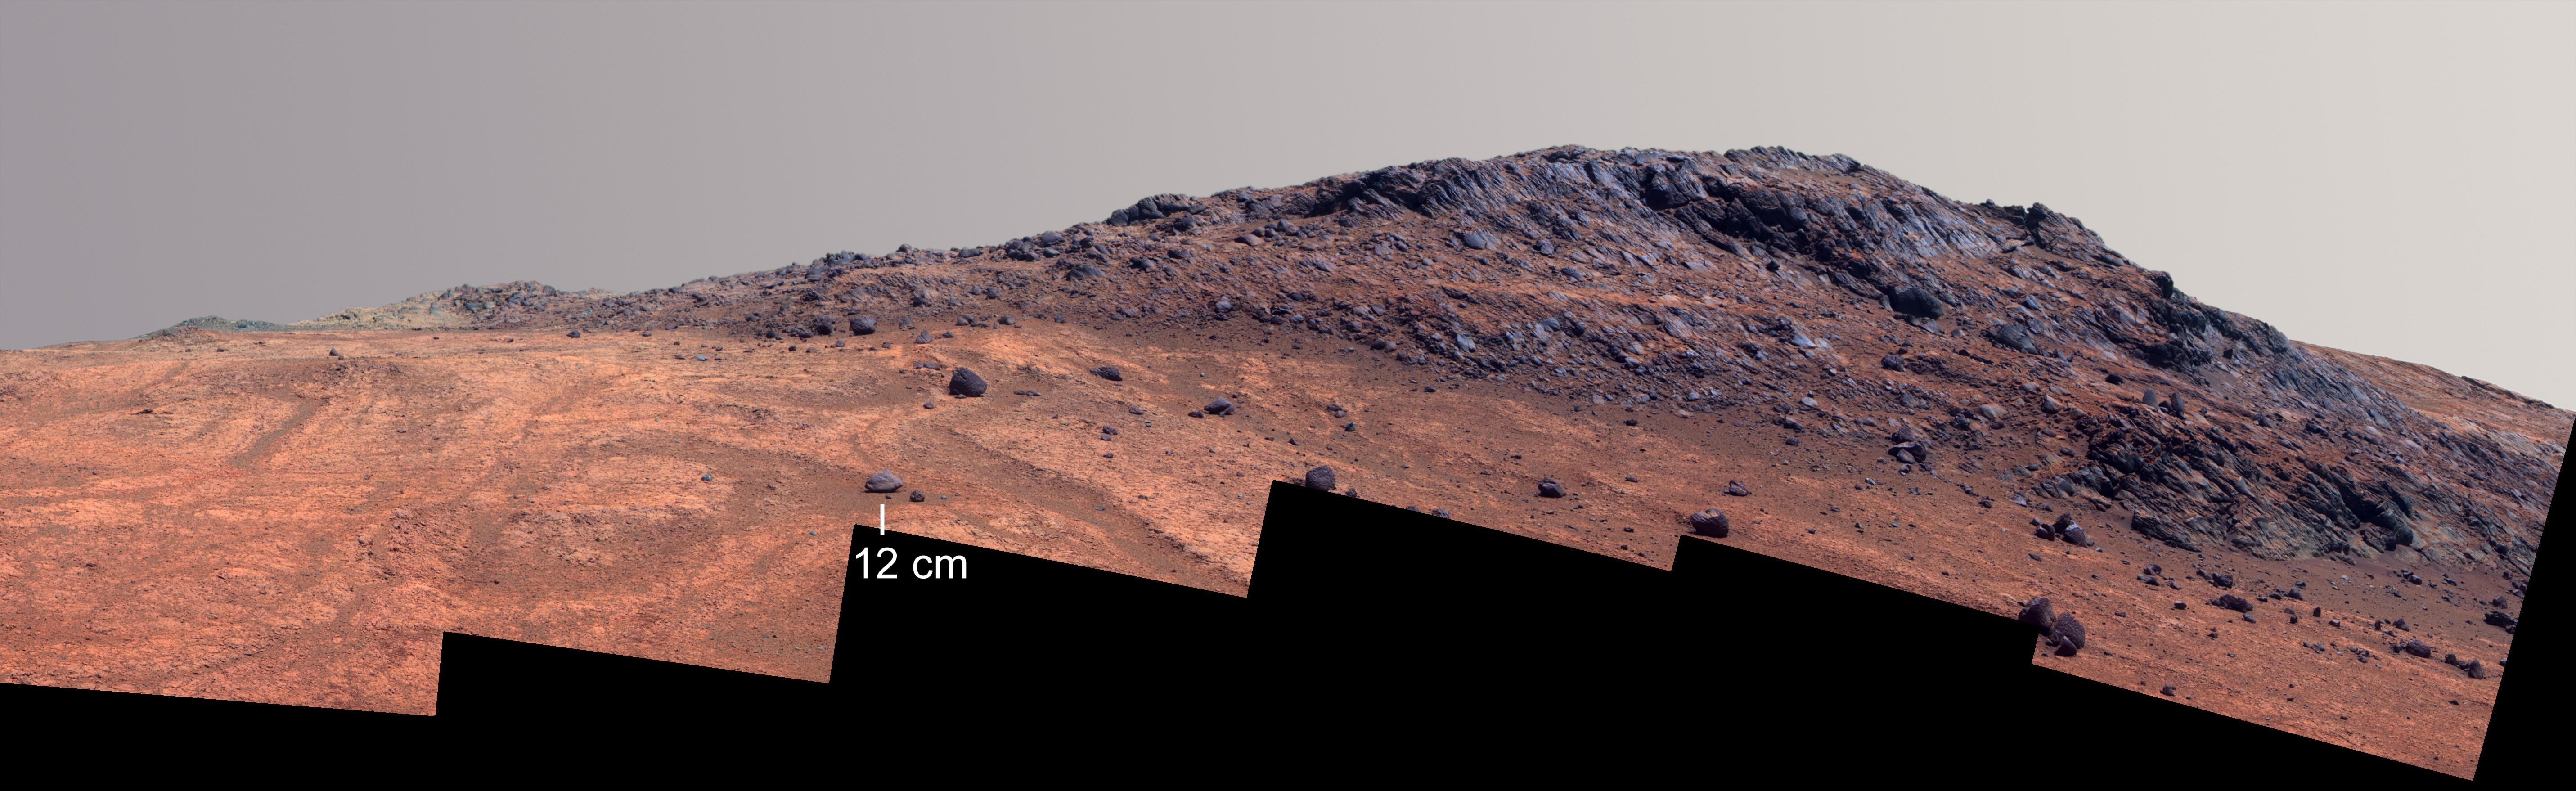 mars-opportunity-rover-marathon-valley-pancam-hills-sol4108_l257f-pia19820-full rens